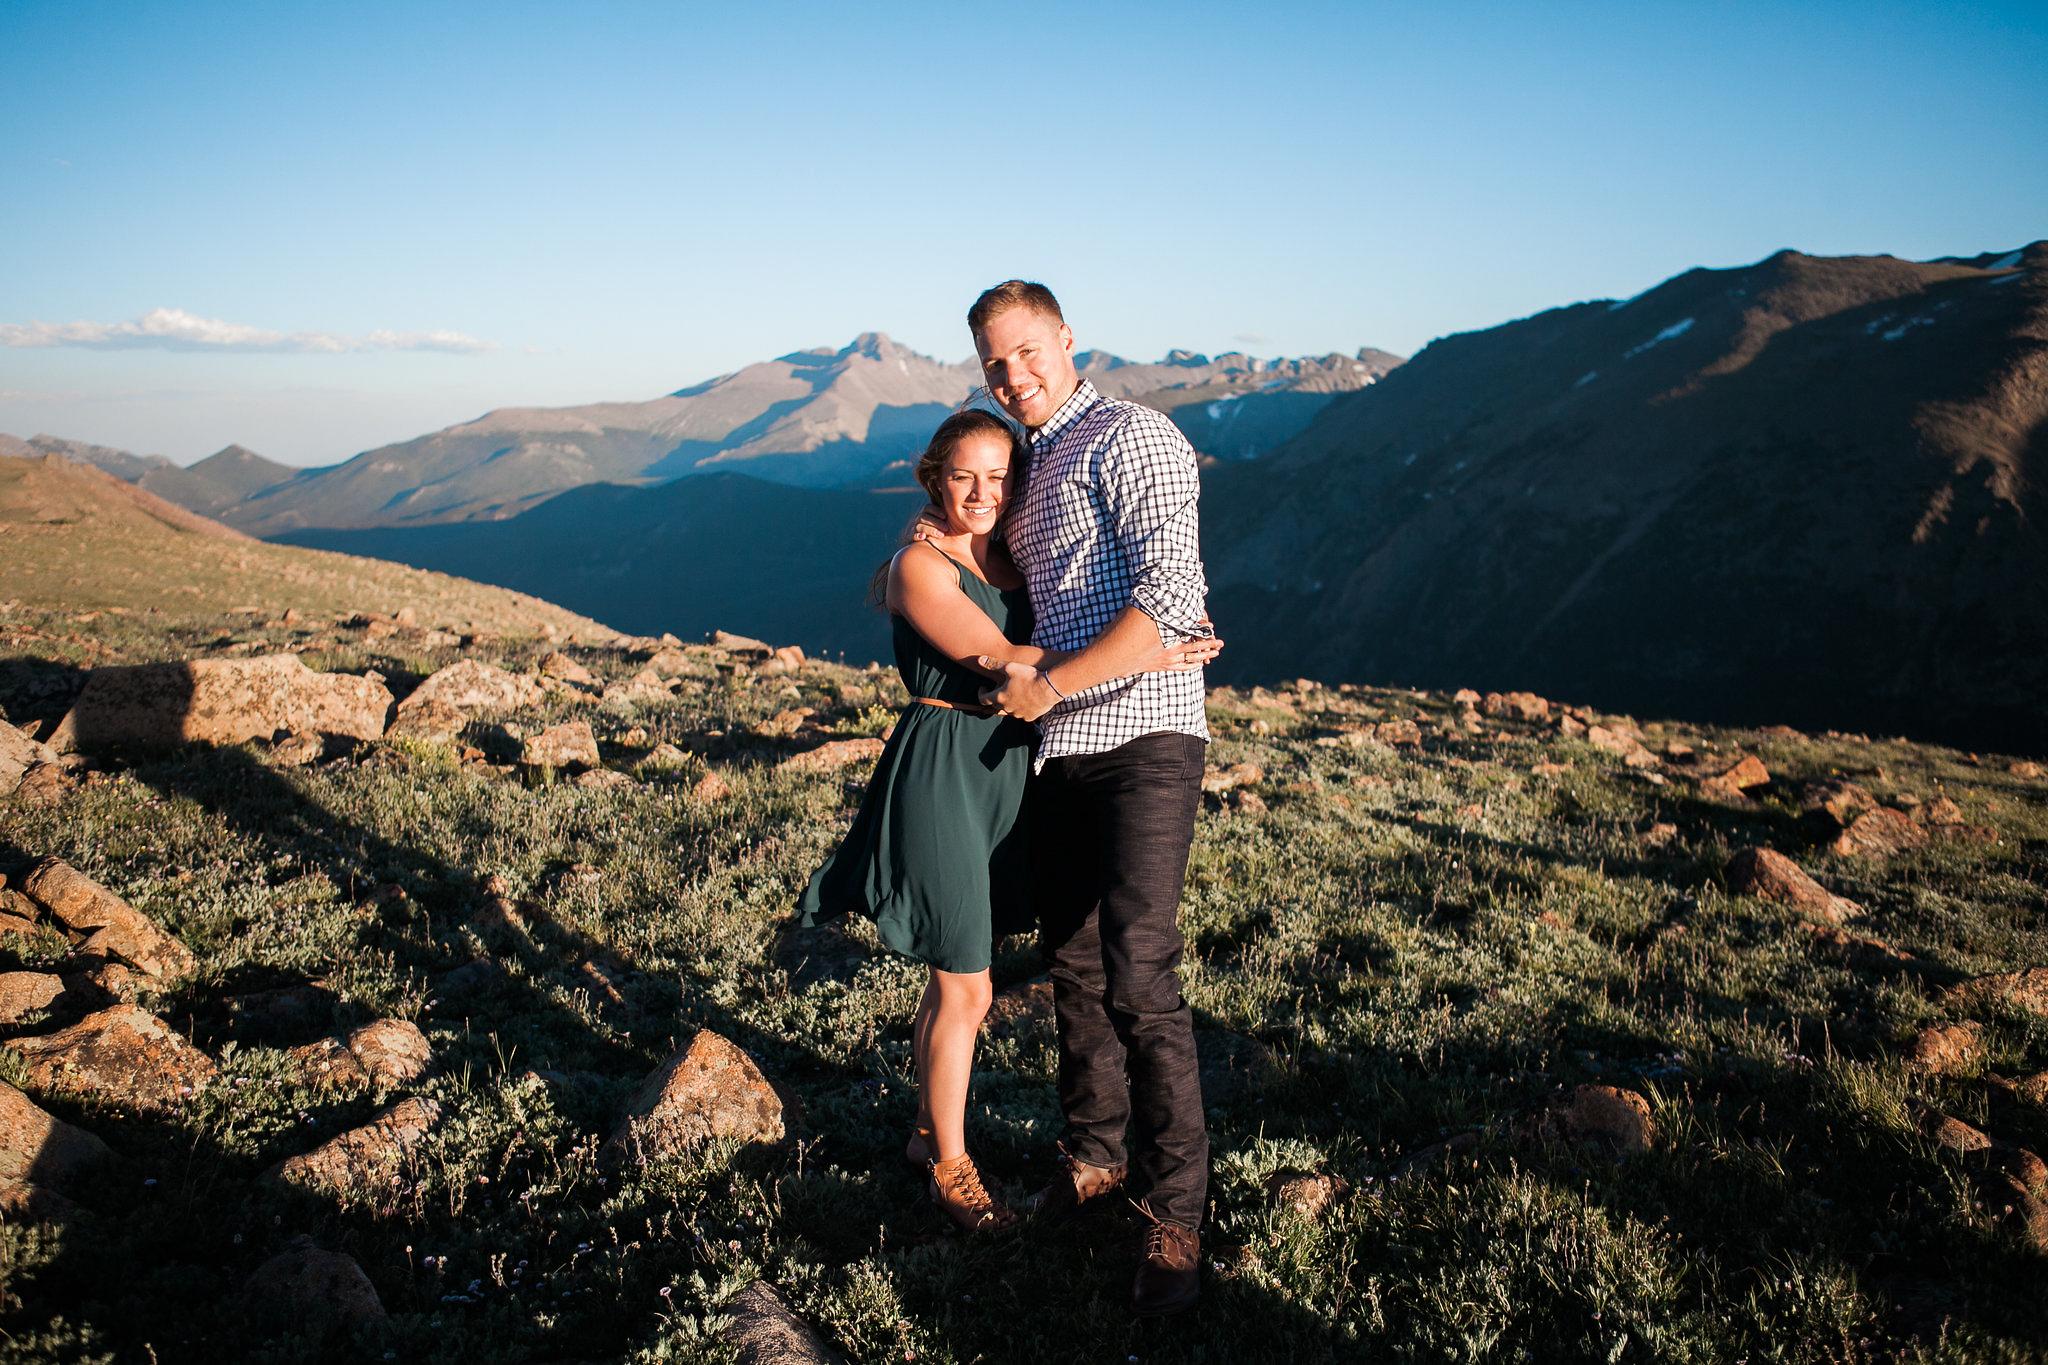 Rocky-Mountain-National-Park-engagement_029.jpg